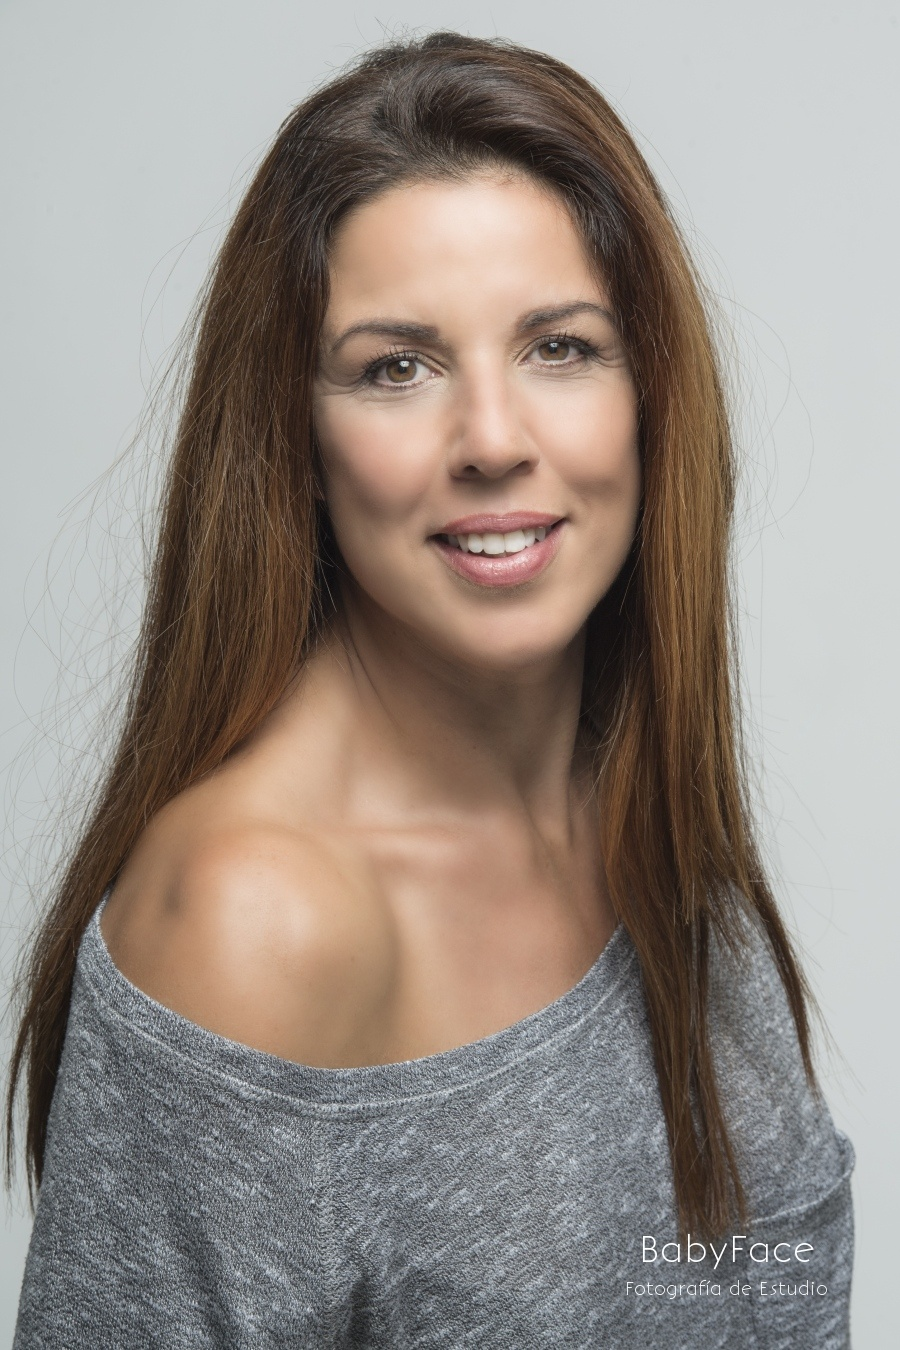 Susana Garrote. http://www.susanagarrote.com/ - BOOKS DE ACTORES - Books de actores.